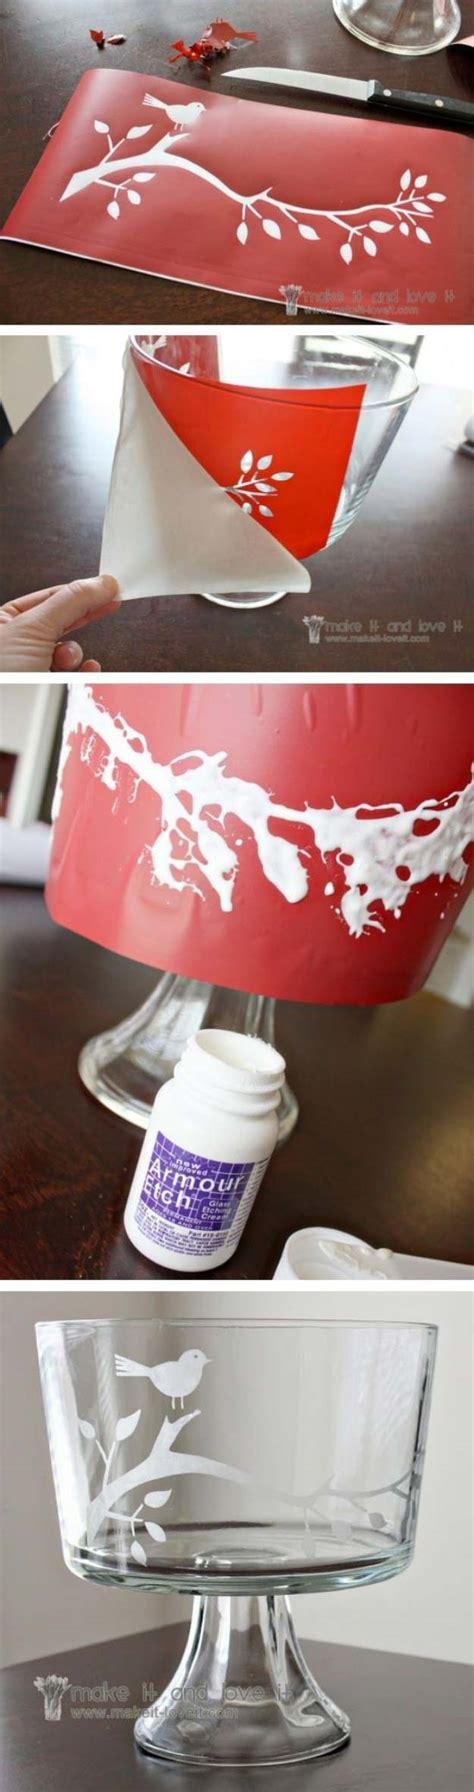 Diy Cricut Crafts Ideas Diy Projects Craft Ideas & How To